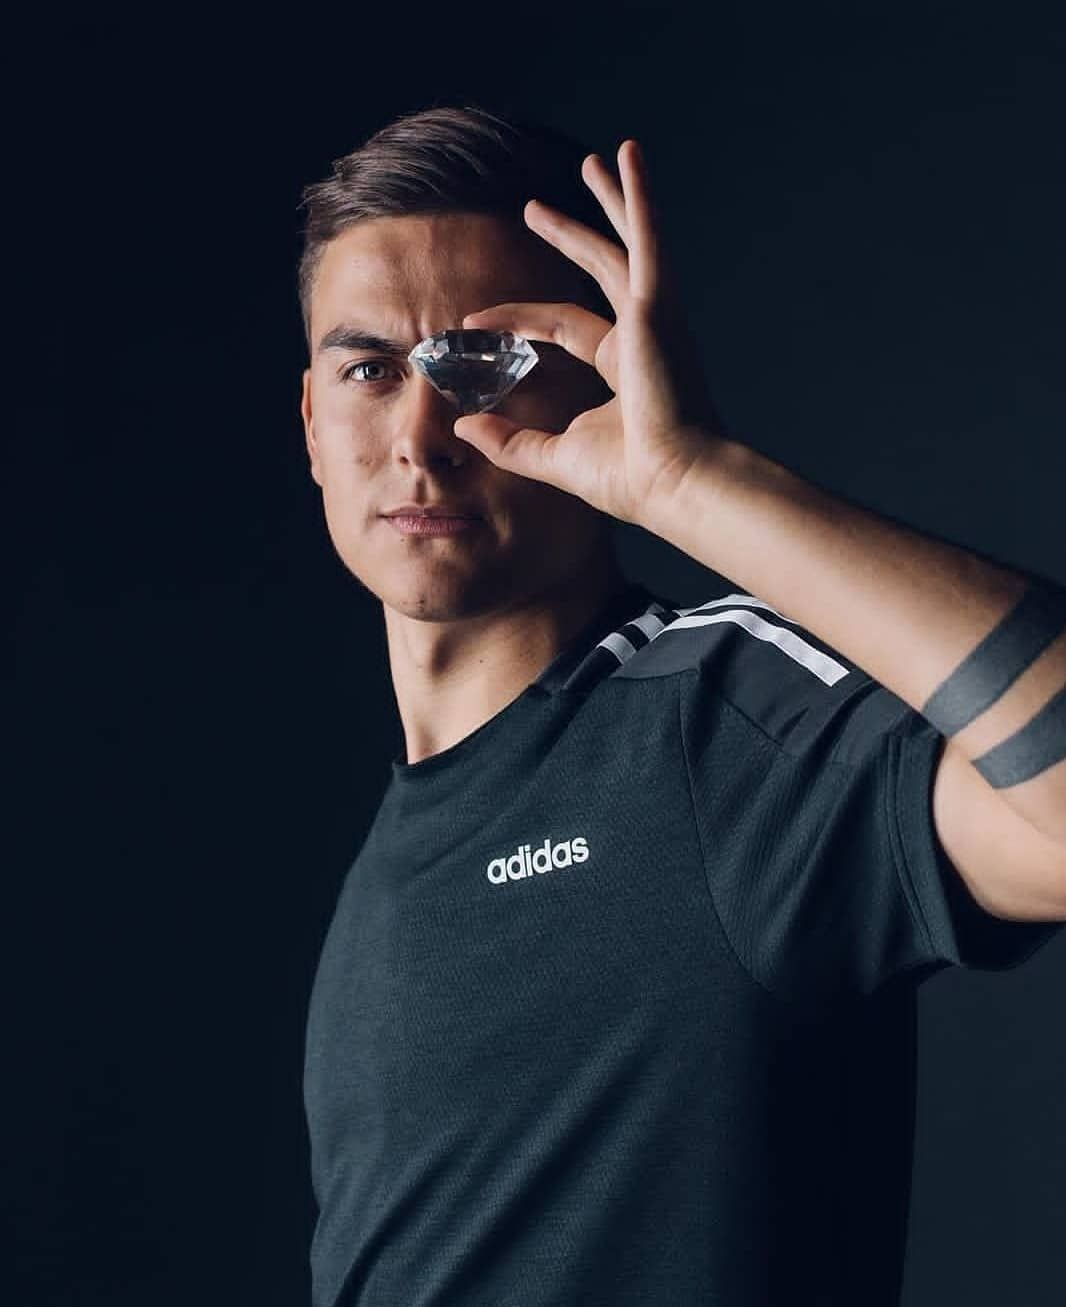 Preparación sin embargo Compositor  Call him 💎 Please follow my back up acc @dybalapix #paulodybala #dybalamask  #dybala #dybalanation #… | Soccer guys, Best football players, Ronaldo